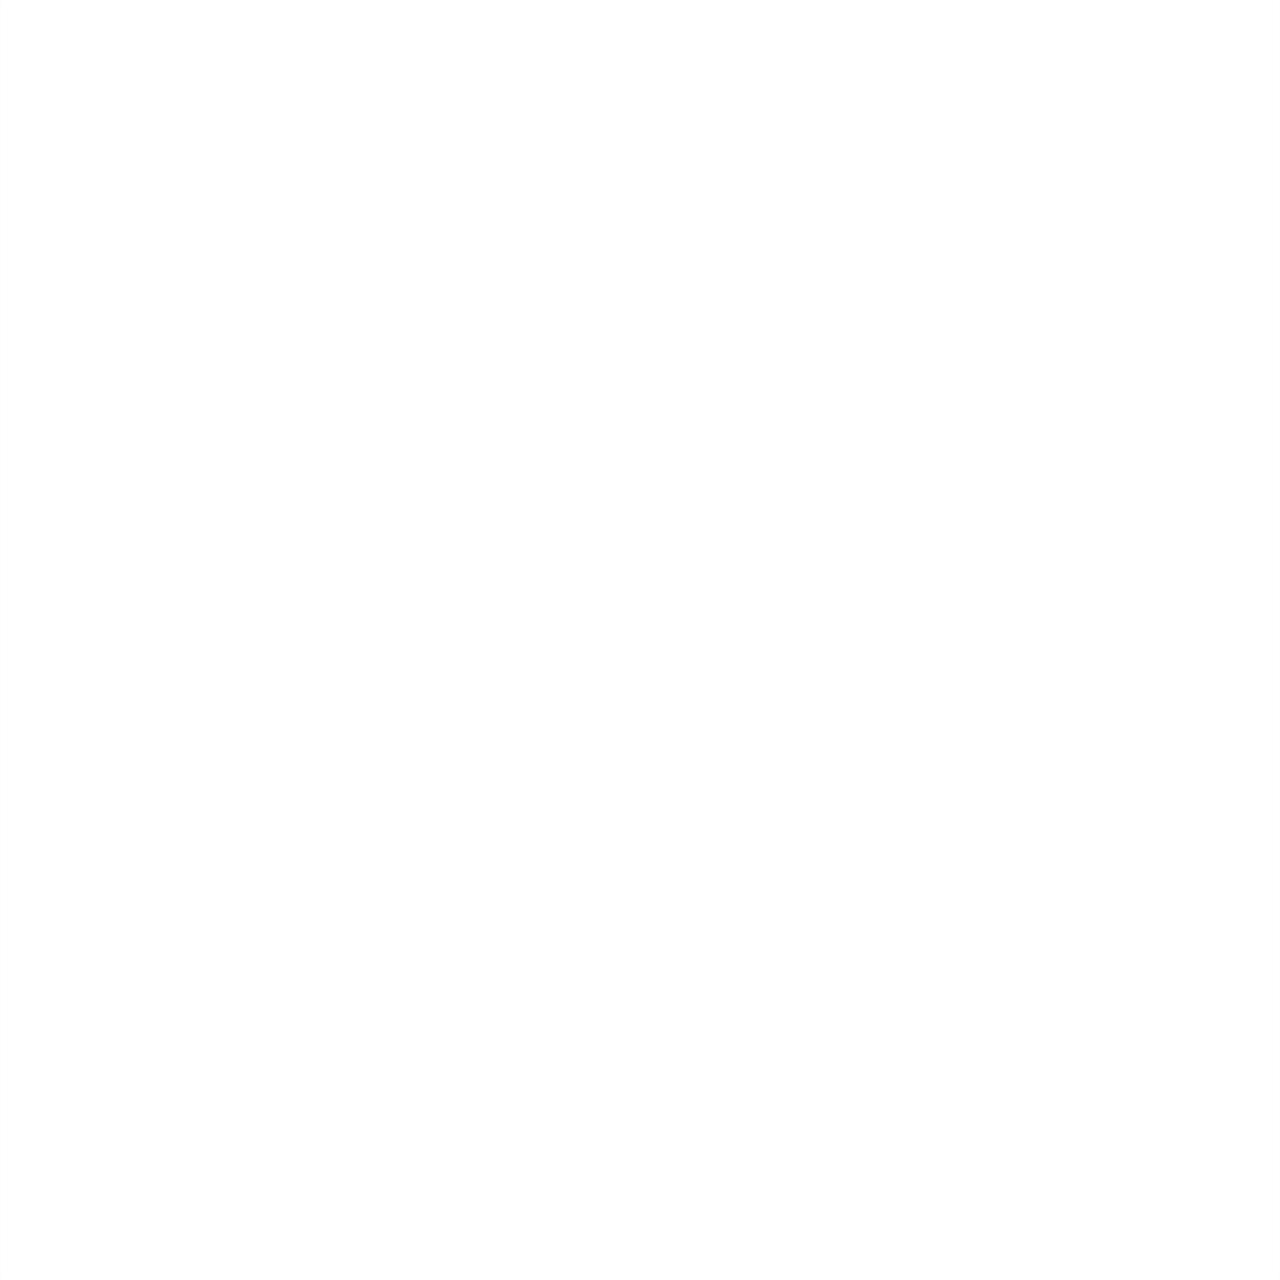 Алюкобонд белый (3мм/12мкм) 1,22мХ2,44м